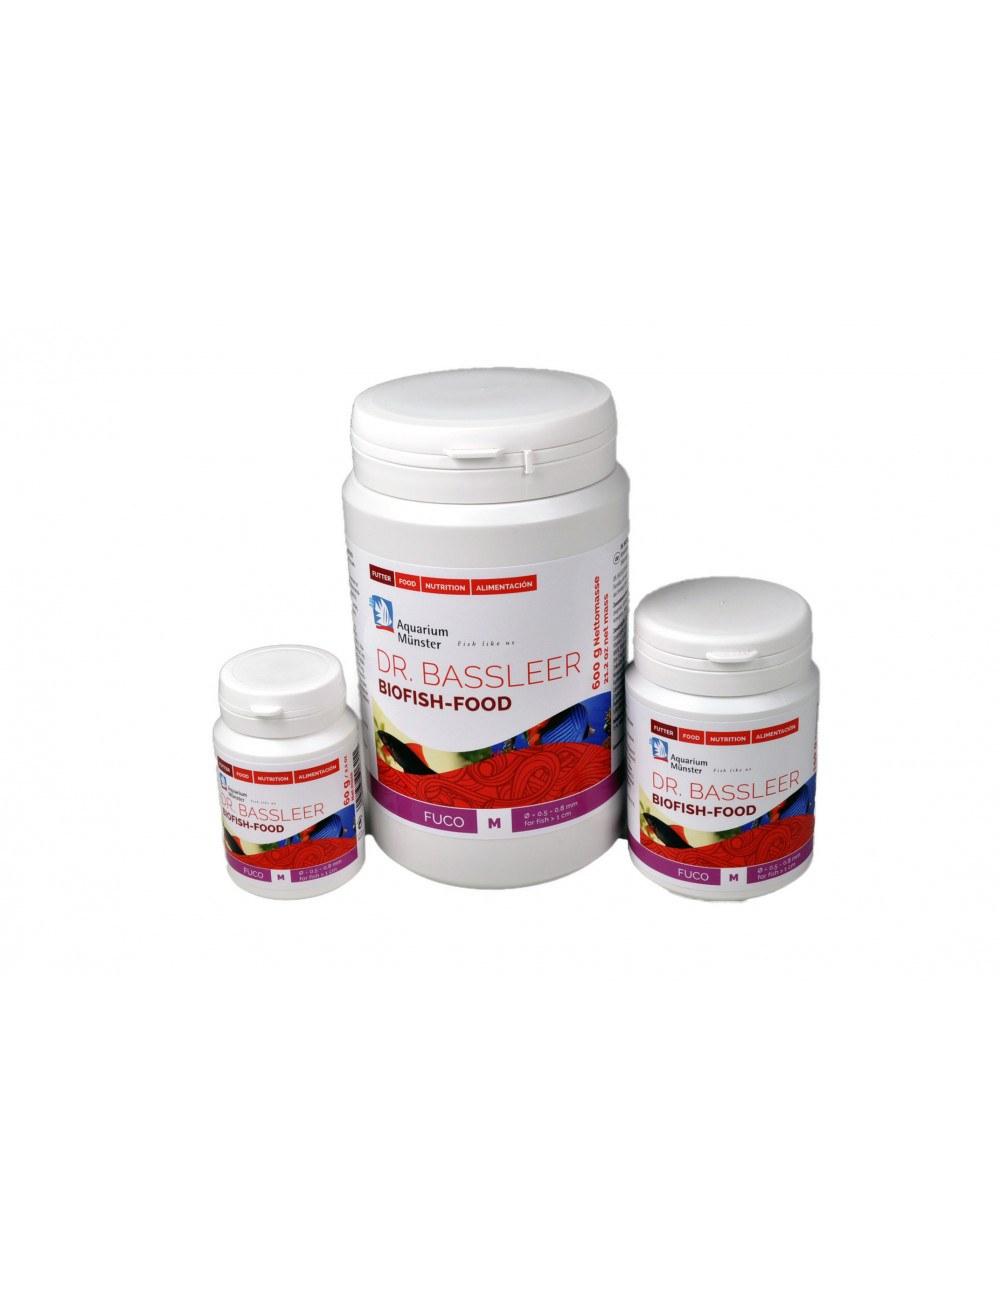 Dr. Bassleer - BIOFISH FOOD - FUCO L - 60gr - Nourriture pour poissons